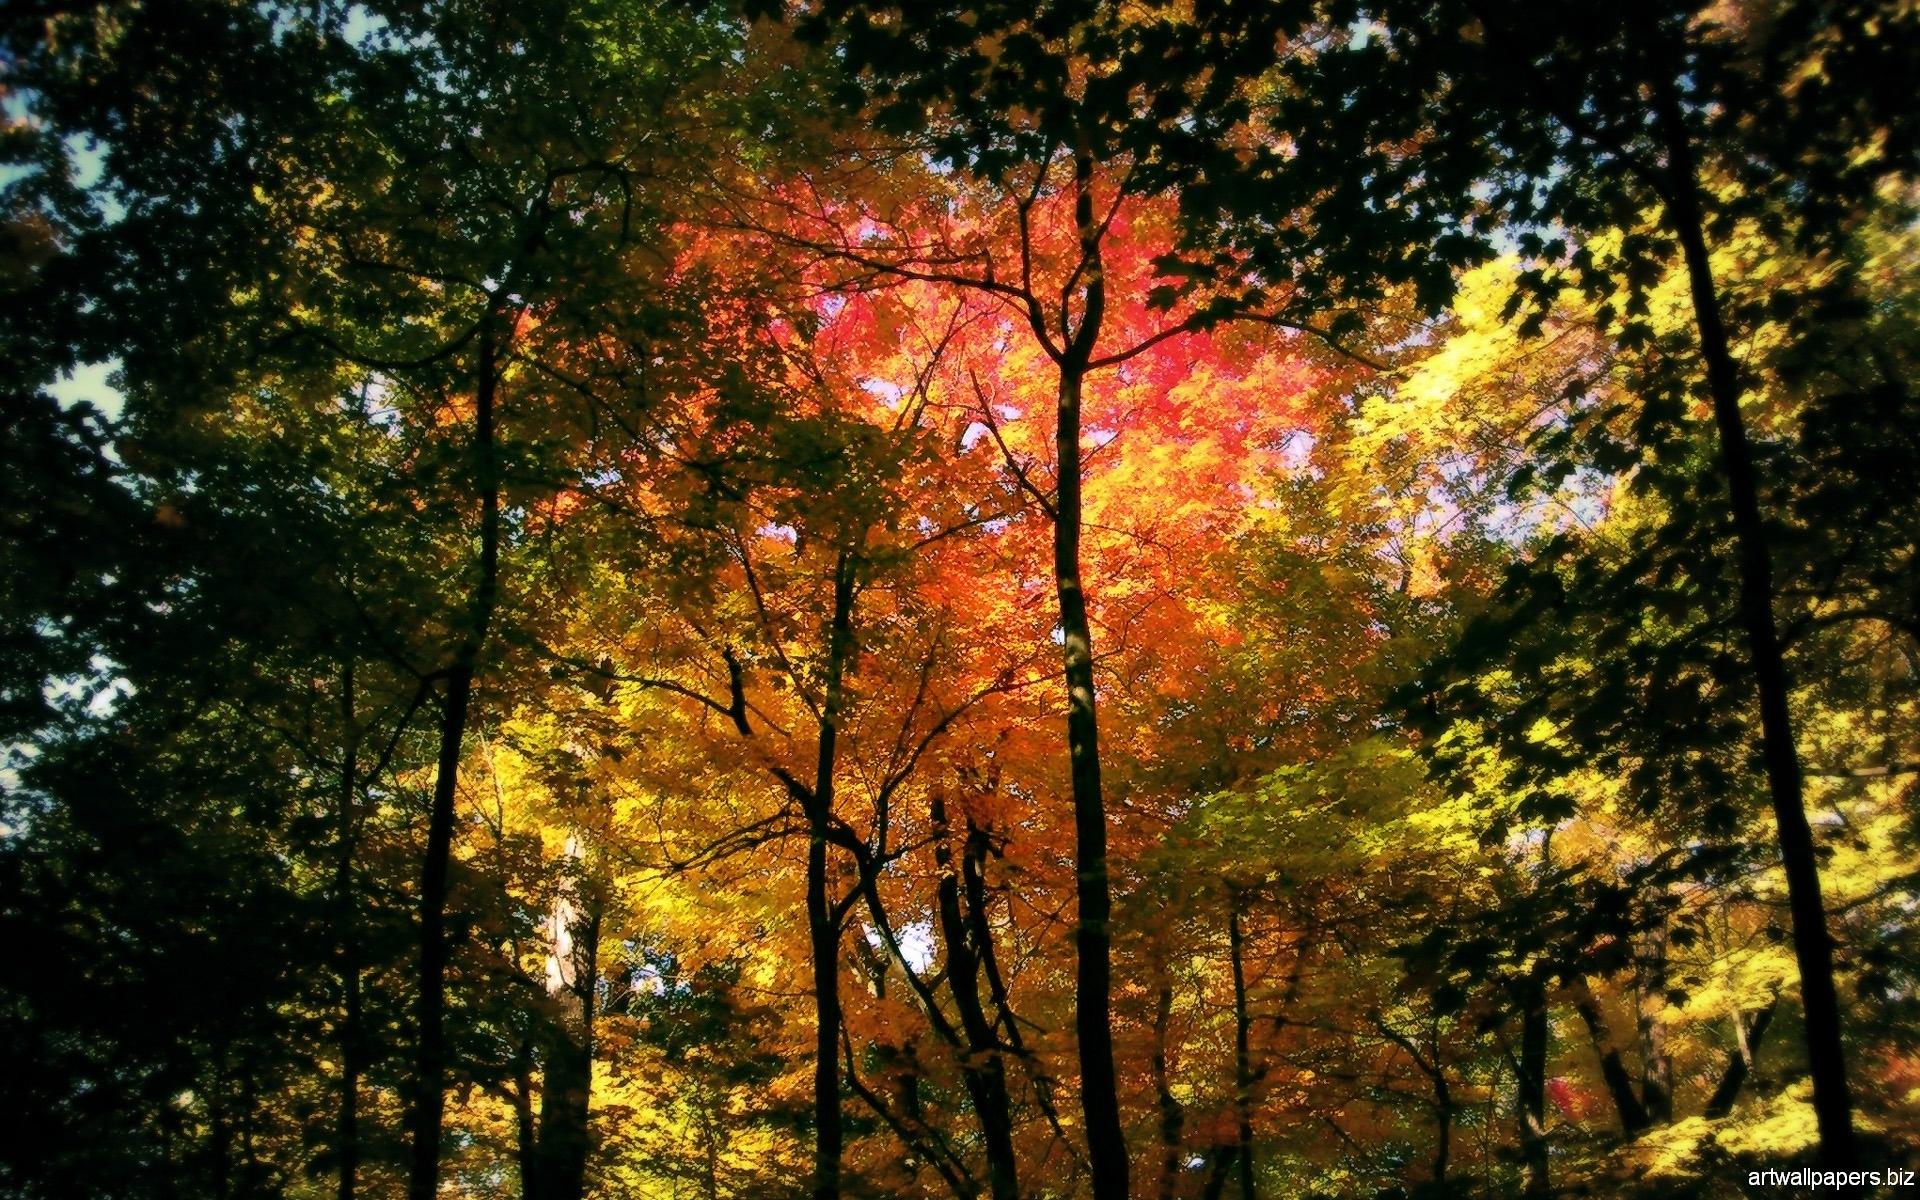 Autumn Wallpapers Autumn Widescreen Wallpapers Full HD 1080p 1920x1200